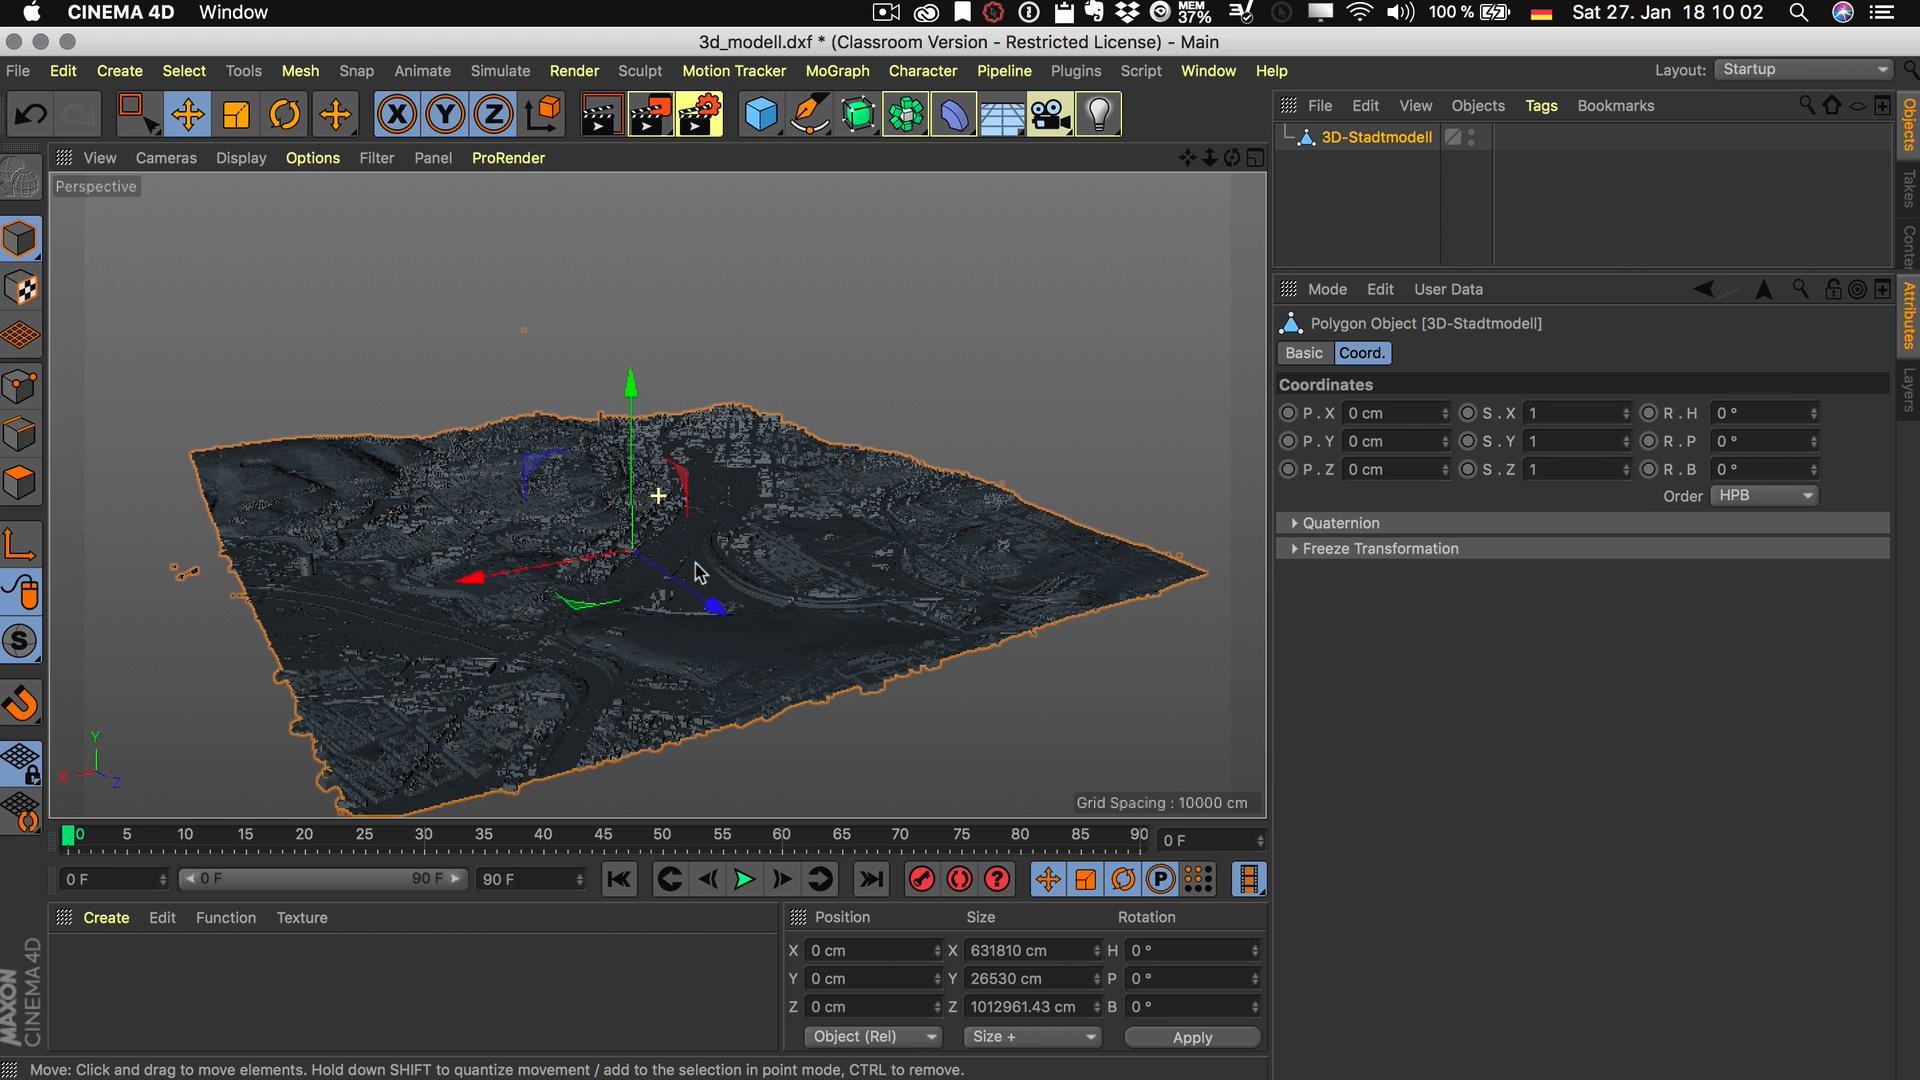 Cinema4D 3D-Stadtmodell Modell Position Nullpunkt